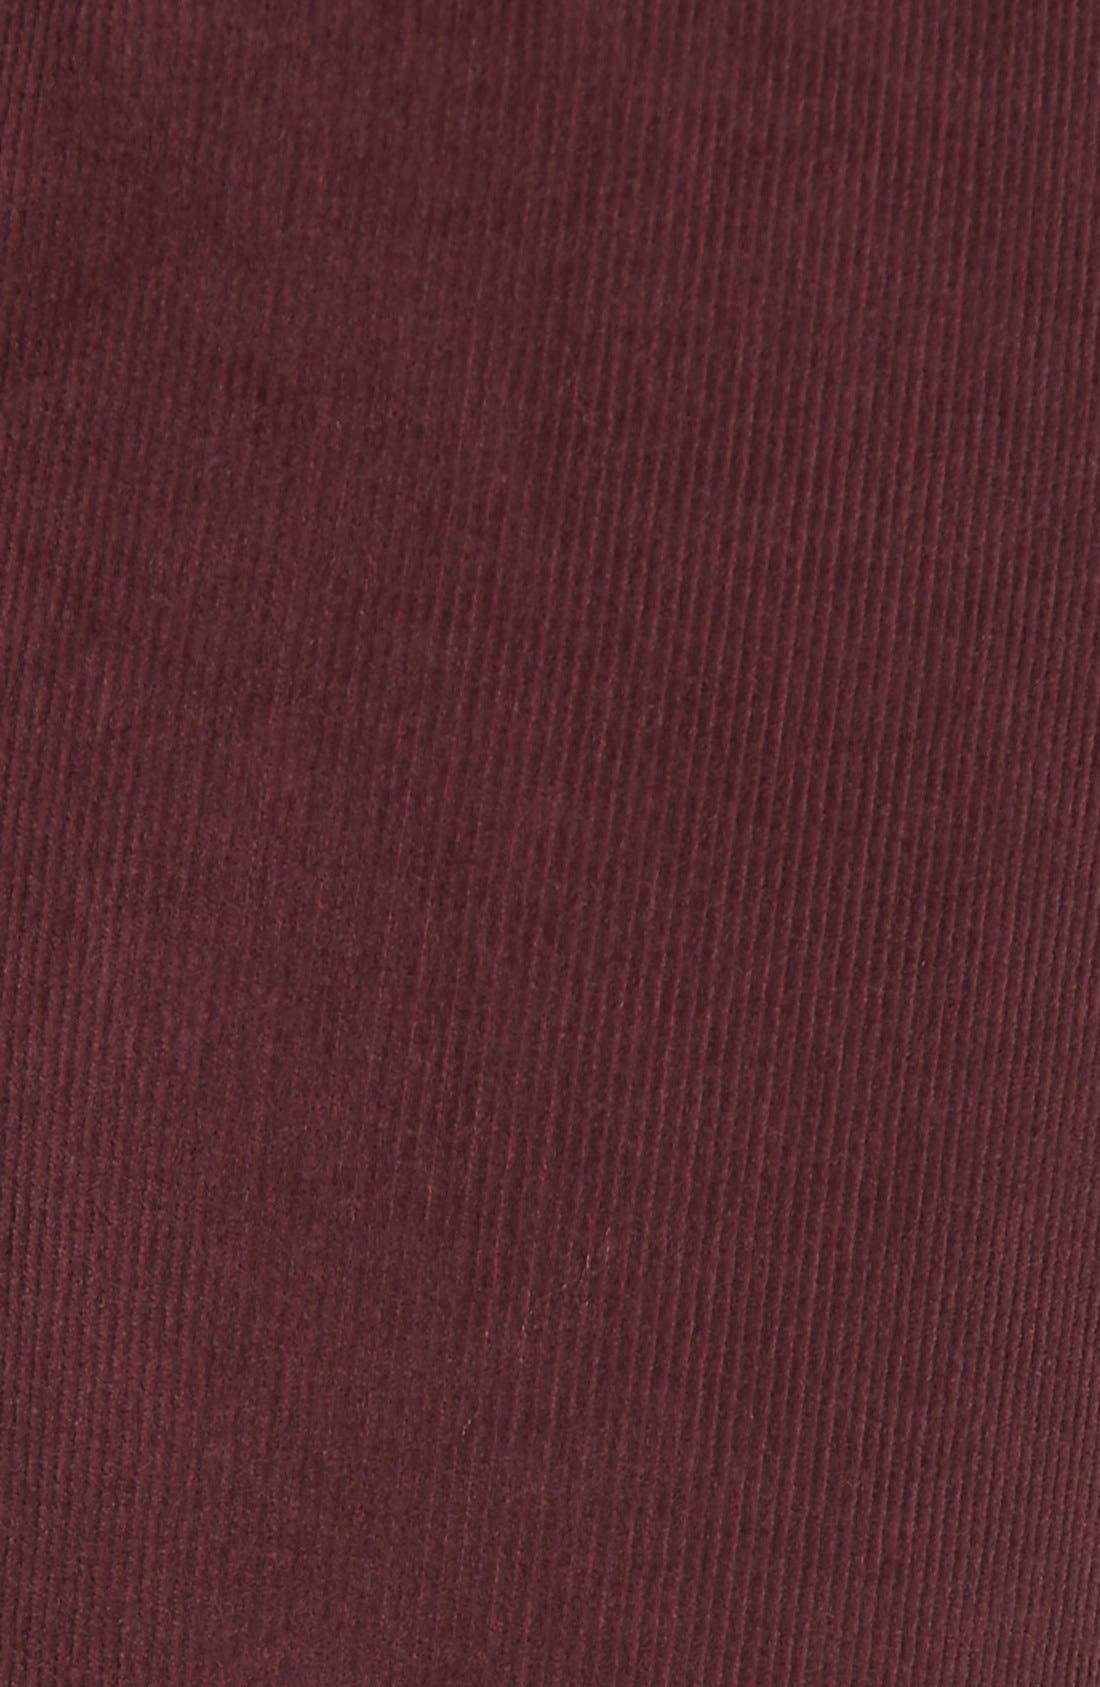 'Verdugo' Ankle Skinny Corduroy Pants,                             Alternate thumbnail 6, color,                             500